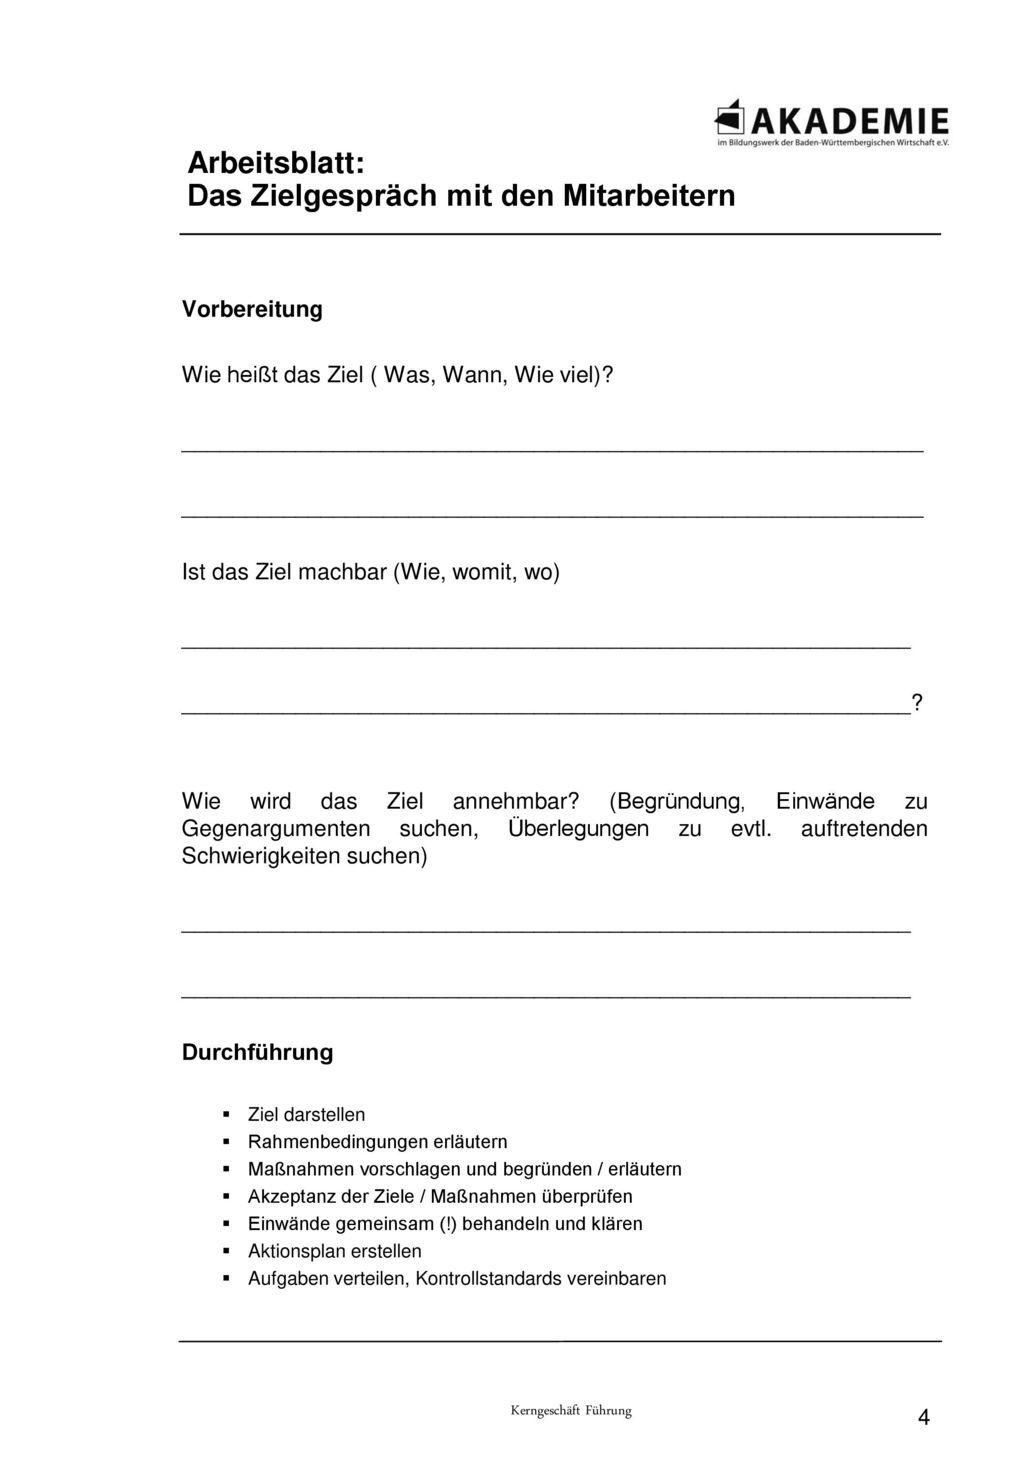 Berühmt Tikki Tikki Tembo Arbeitsblatt Zeitgenössisch - Super Lehrer ...